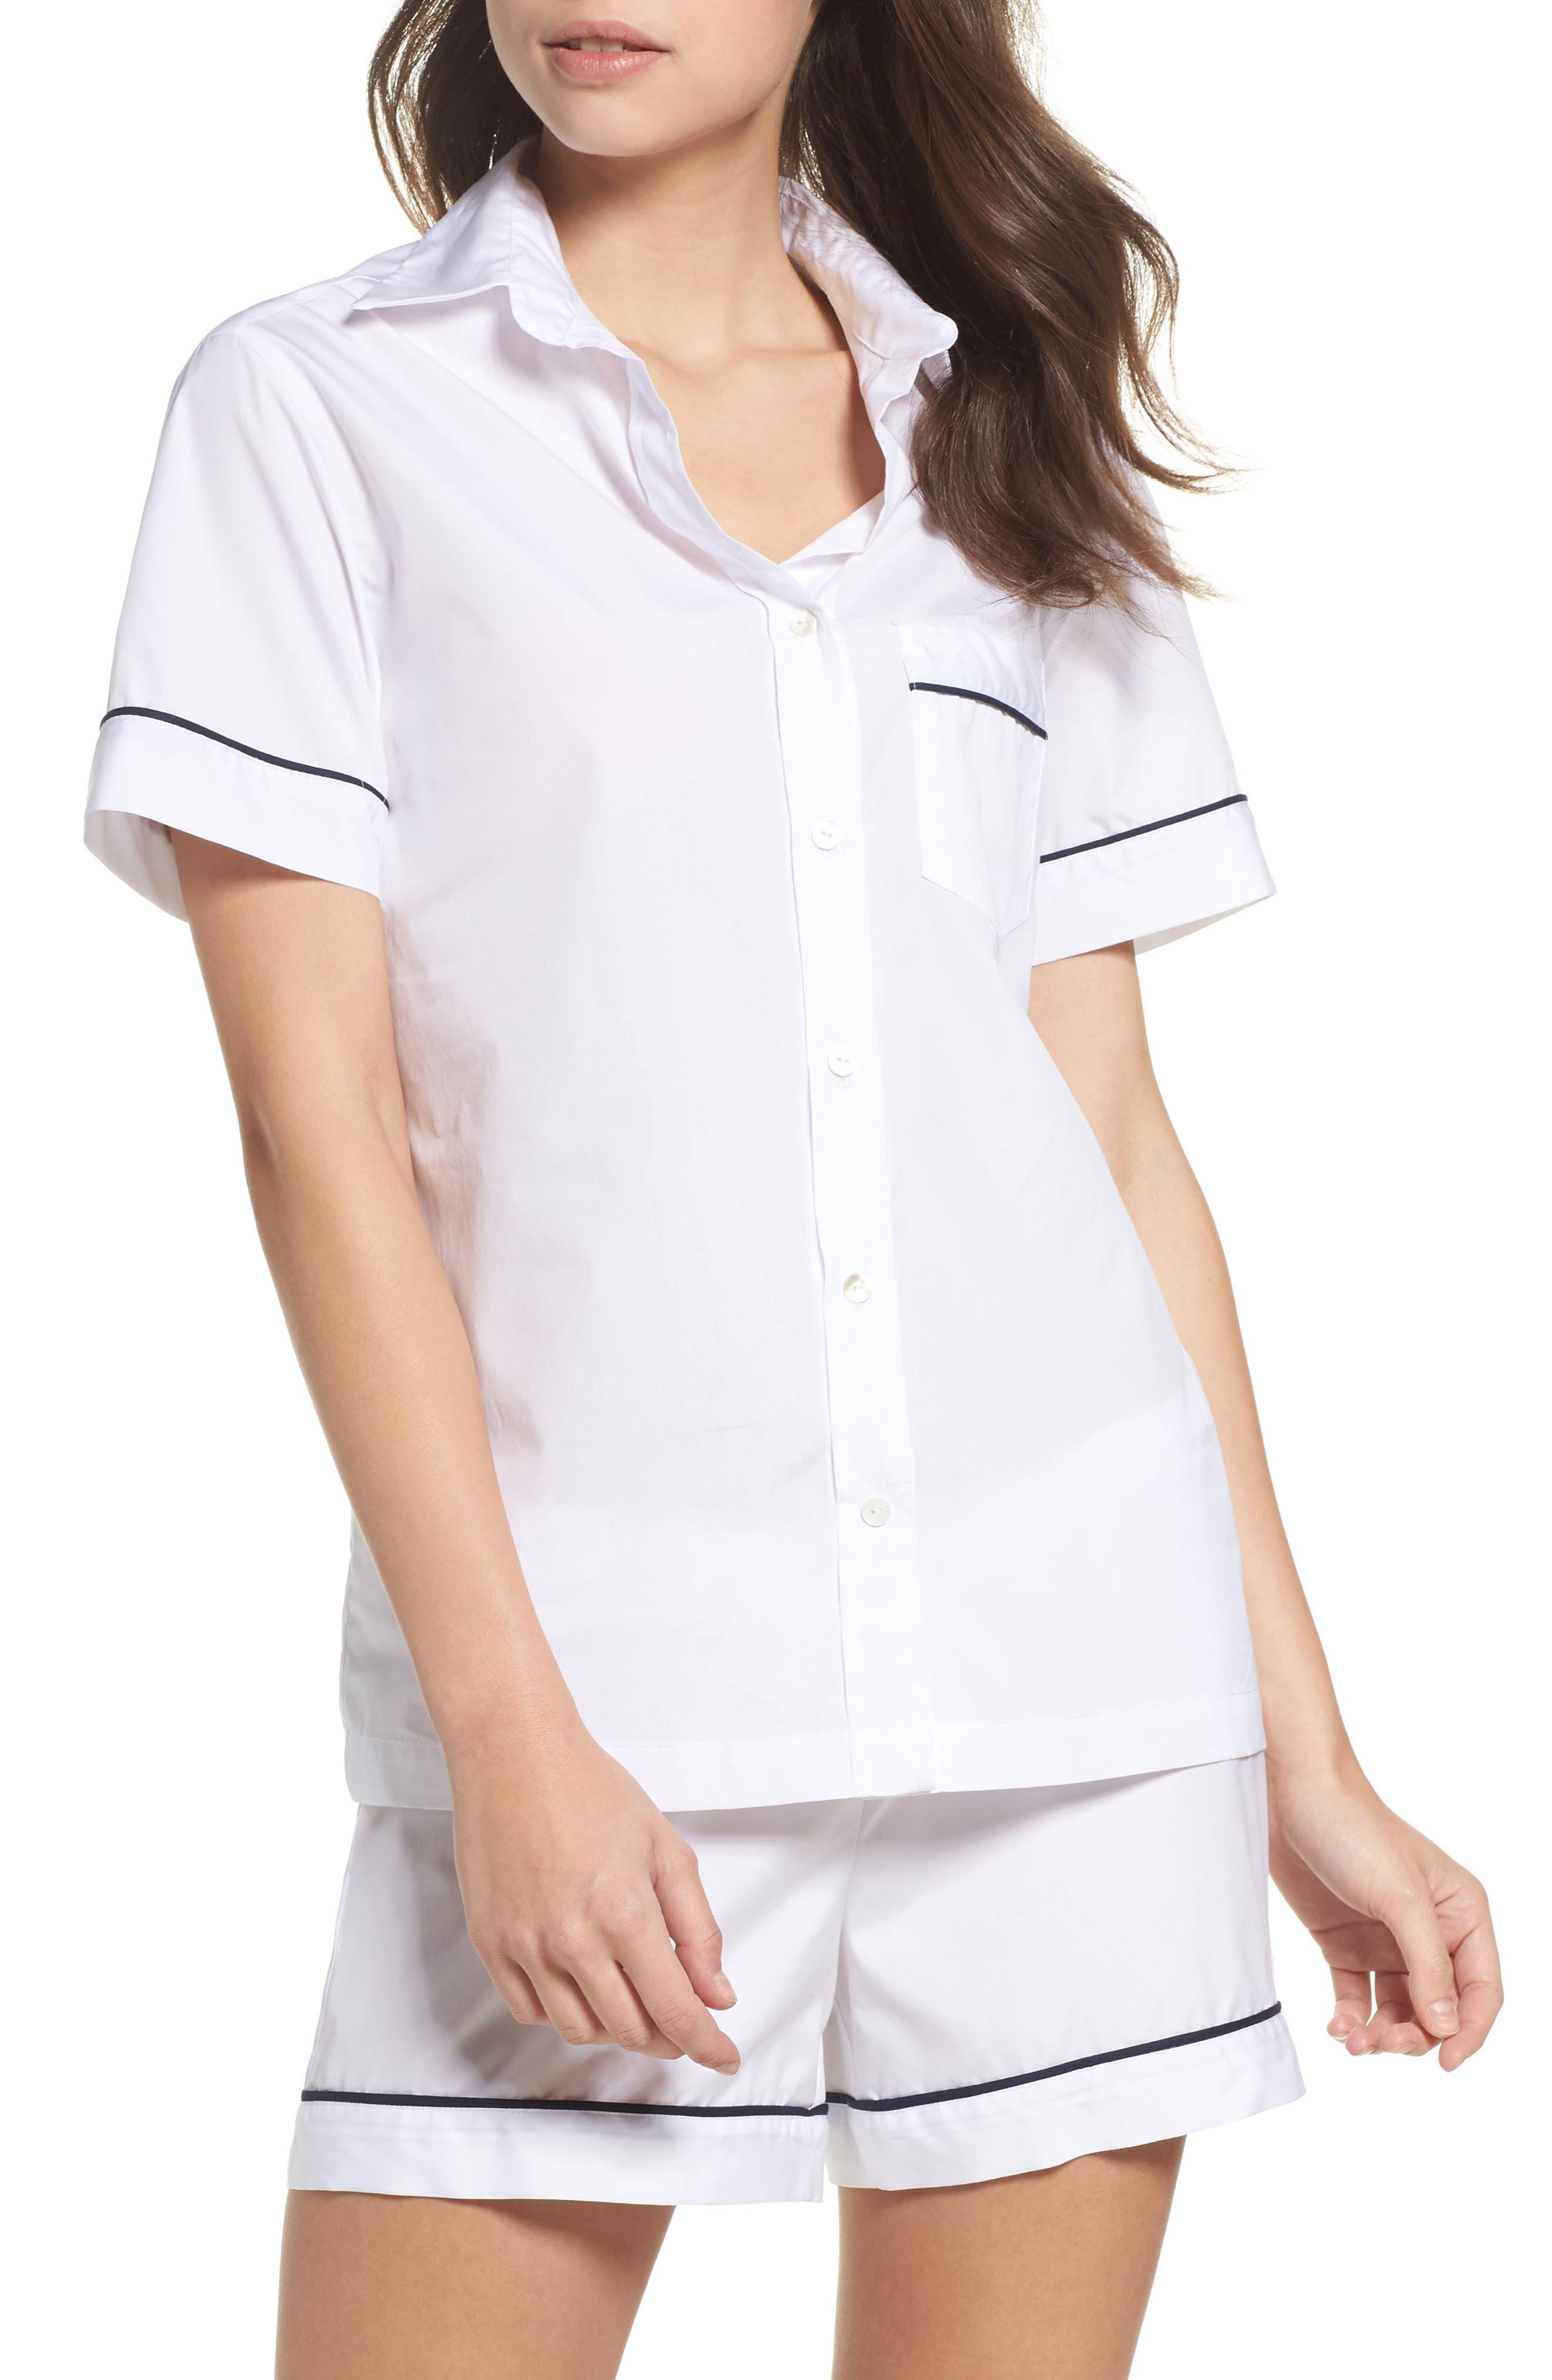 Main Image - Pour Les Femmes Piped Sleep Shirt